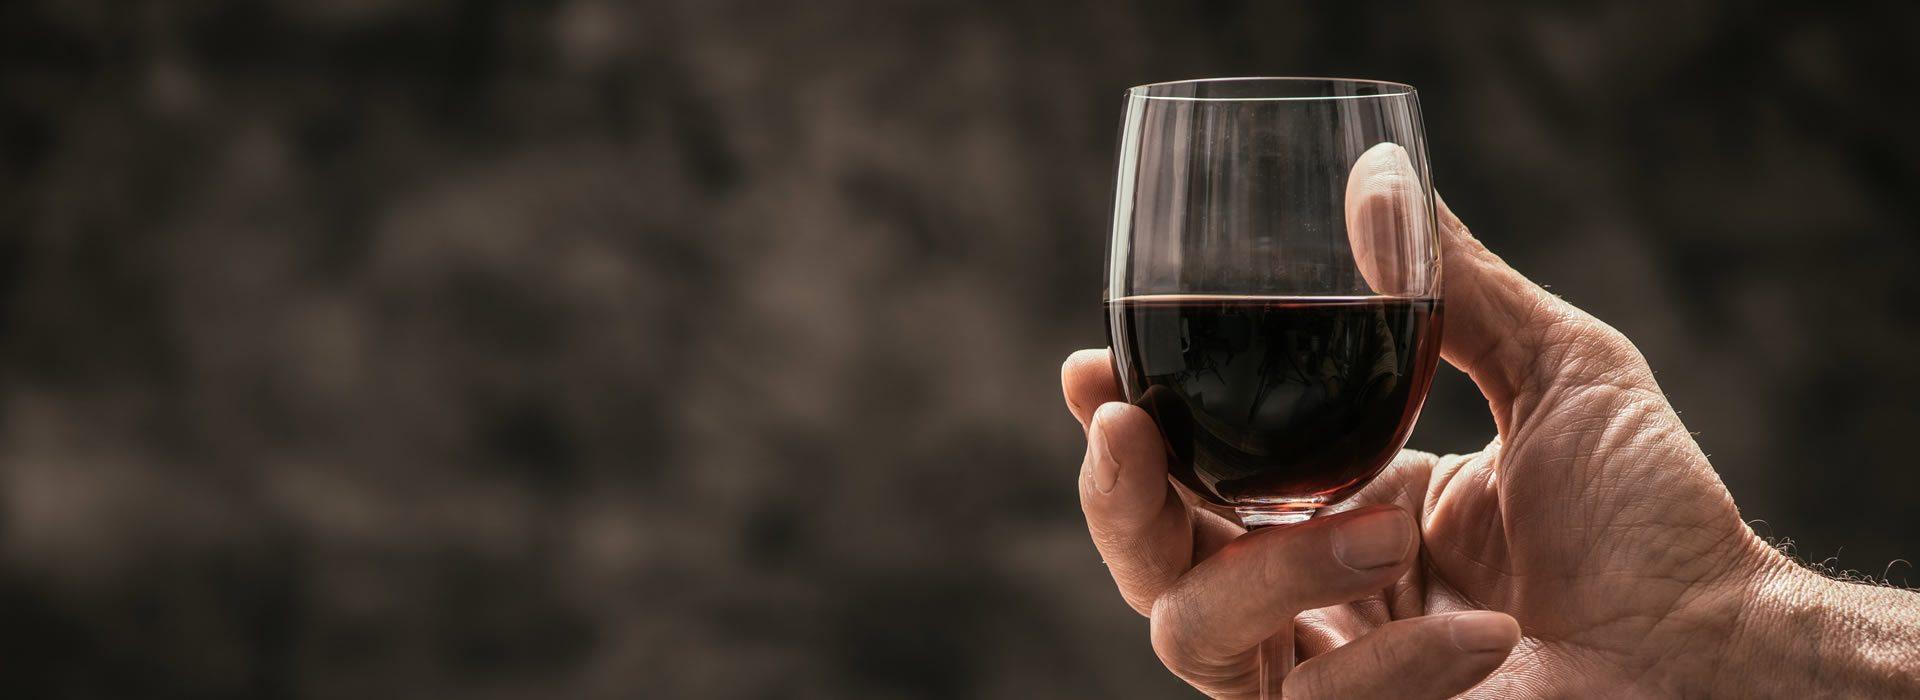 Vineká Wine Business